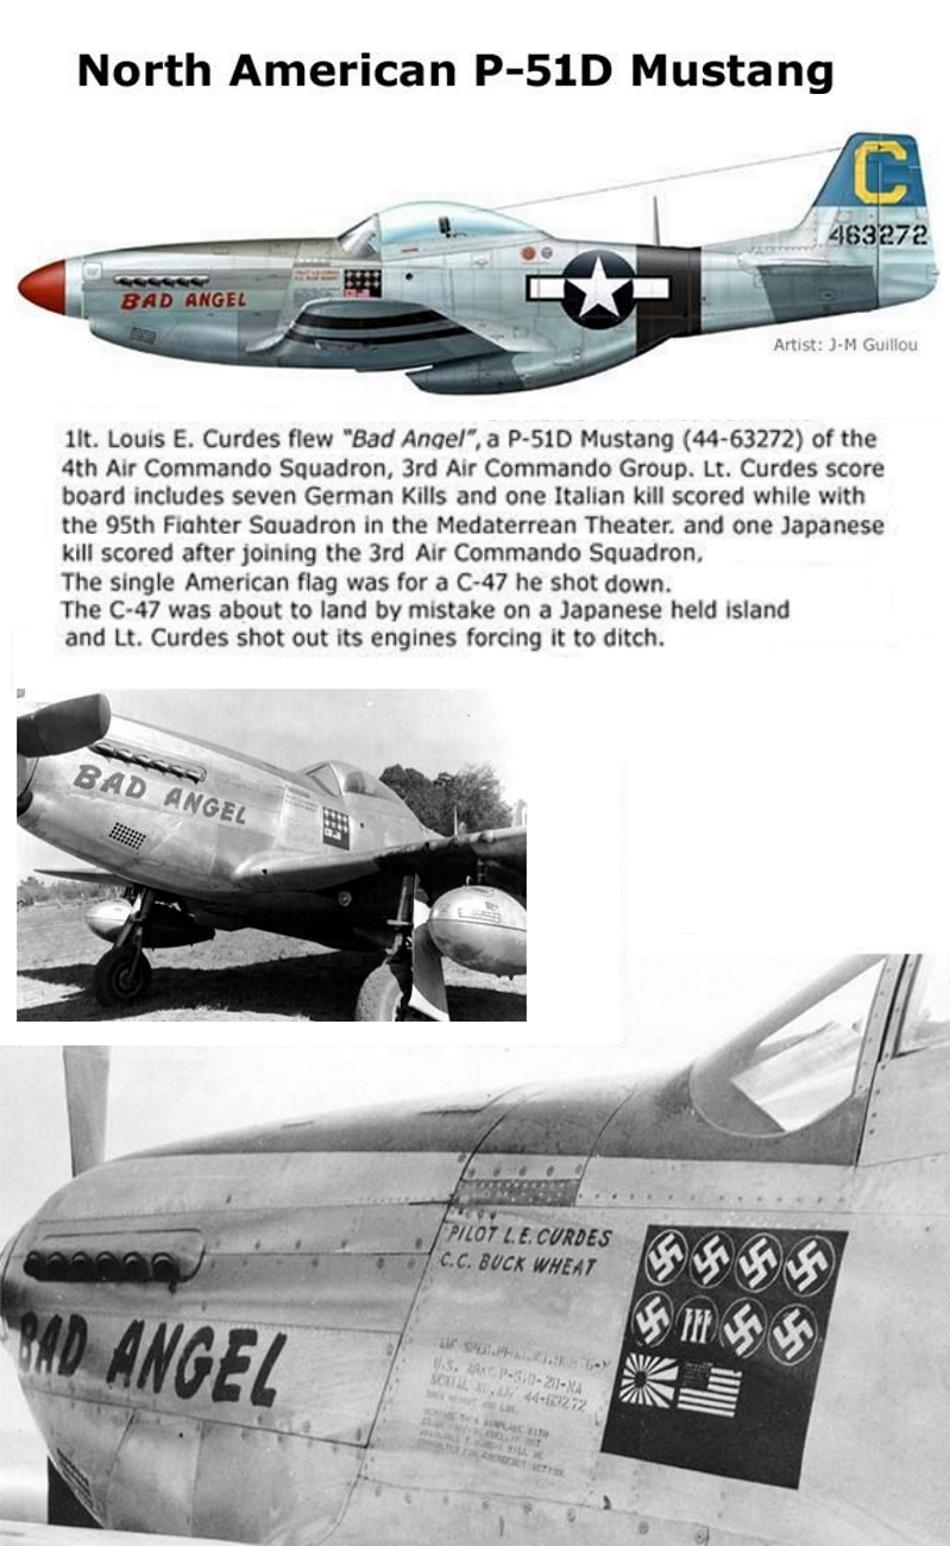 NORTH AMERICAN P-51 MUSTANG P51d-911